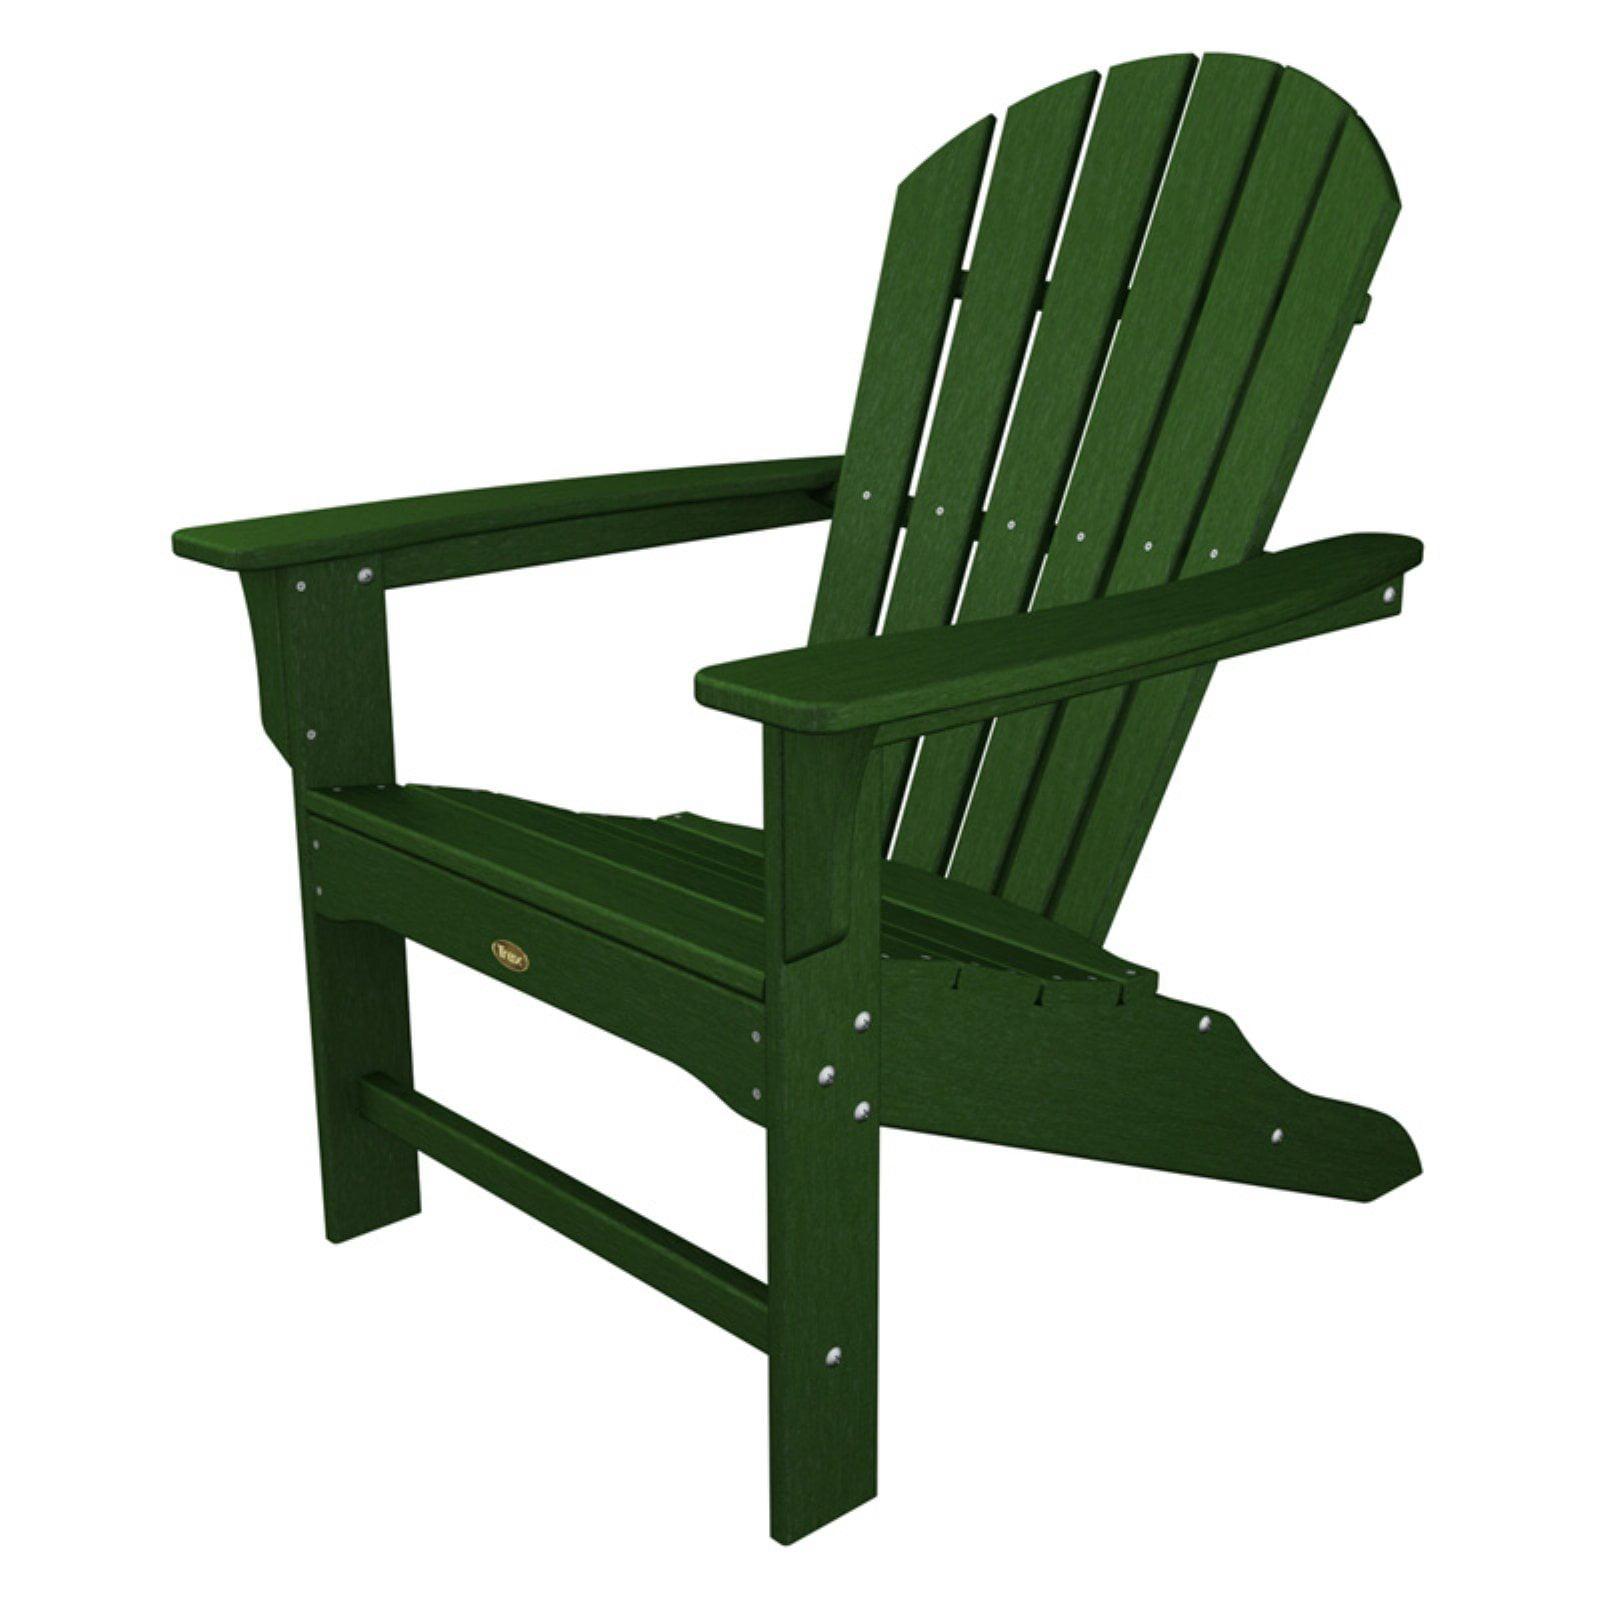 Trex outdoor furniture recycled plastic cape cod adirondack chair walmart com